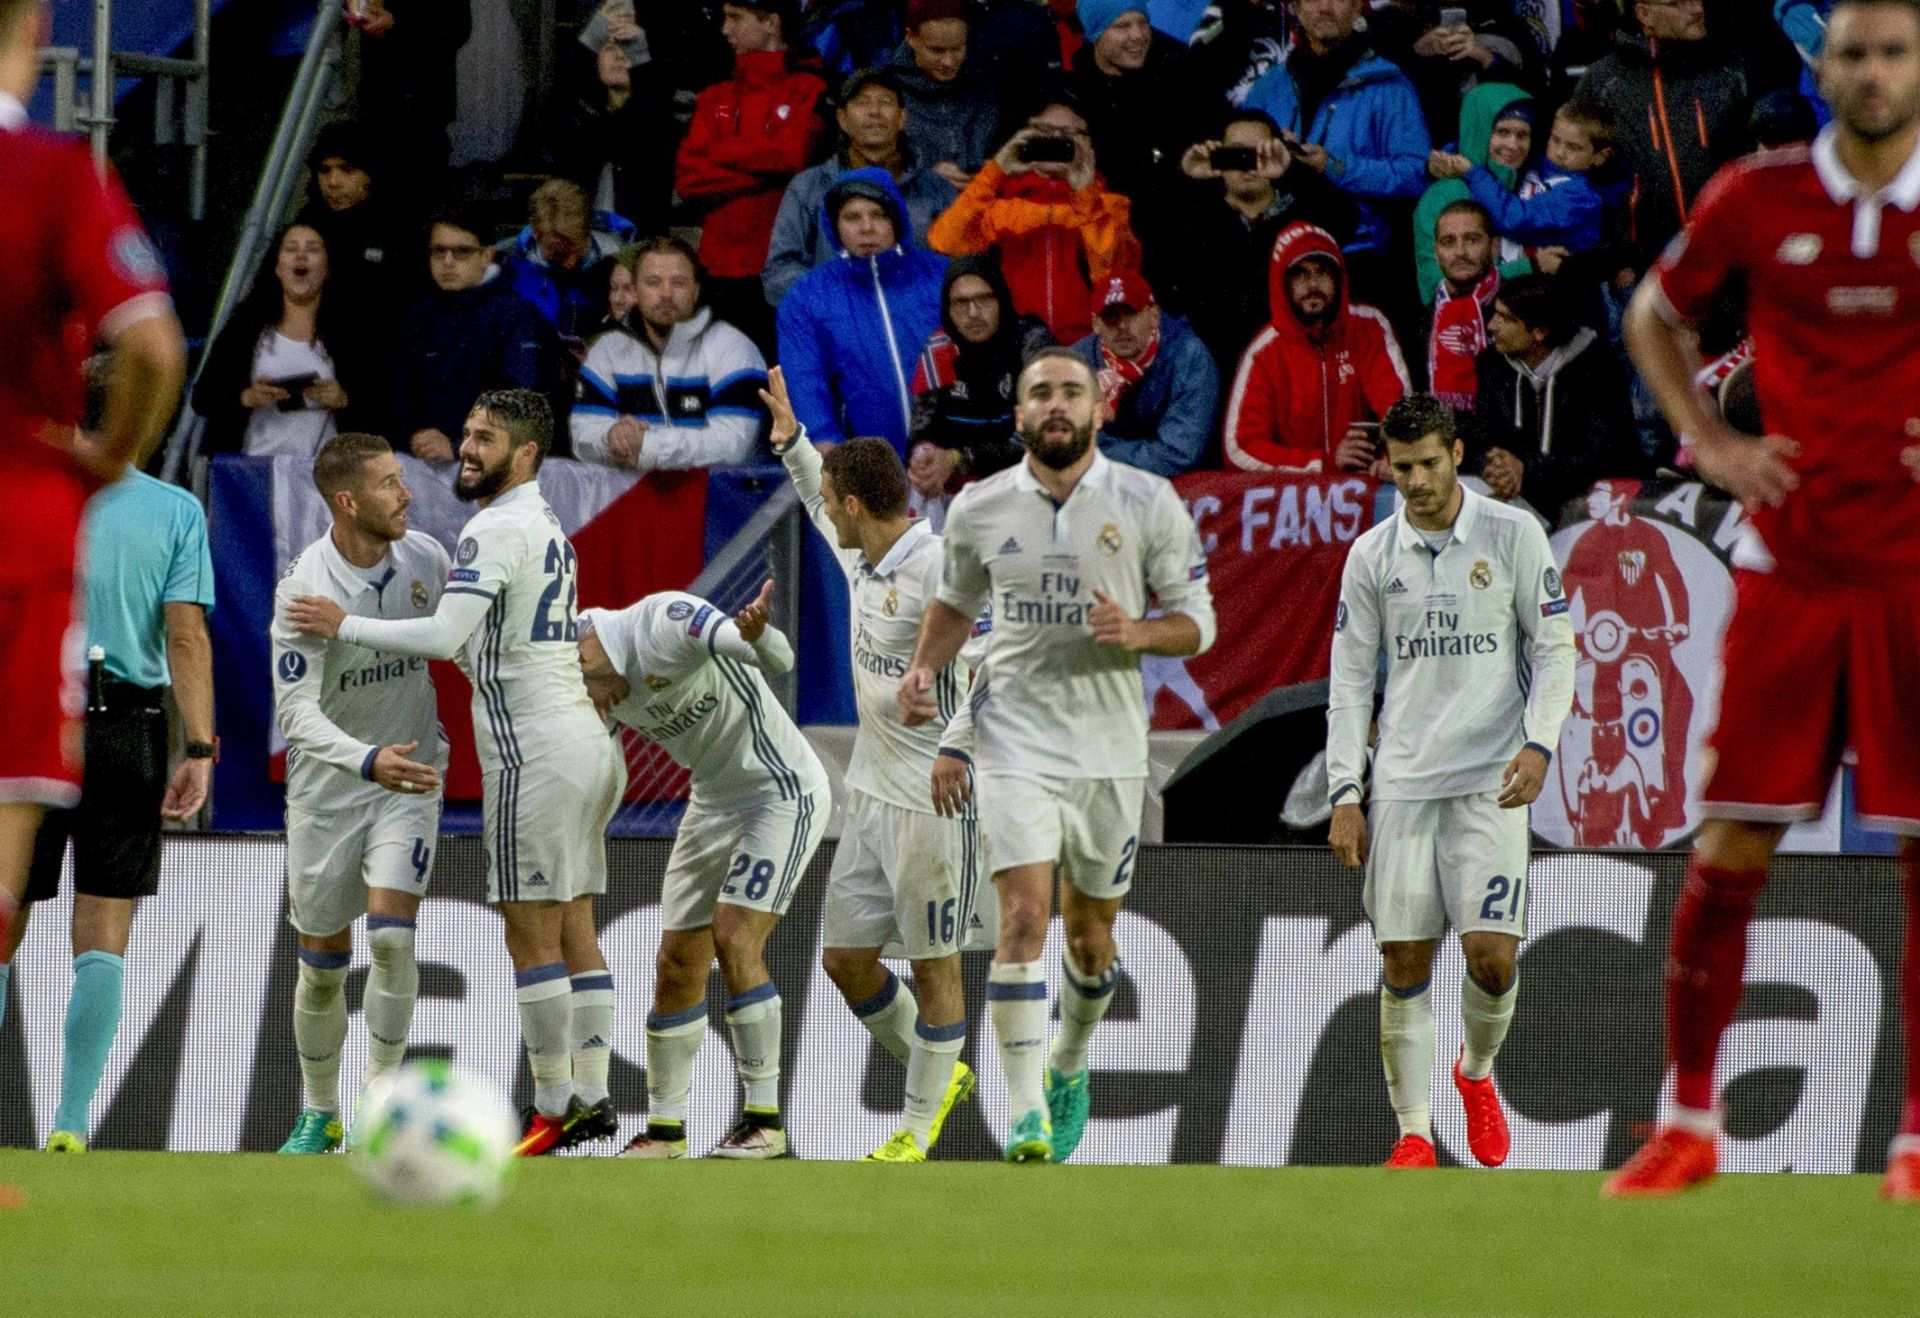 NASTUPILI MODRIĆ I KOVAČIĆ: Real Madrid – Sevilla 3-2